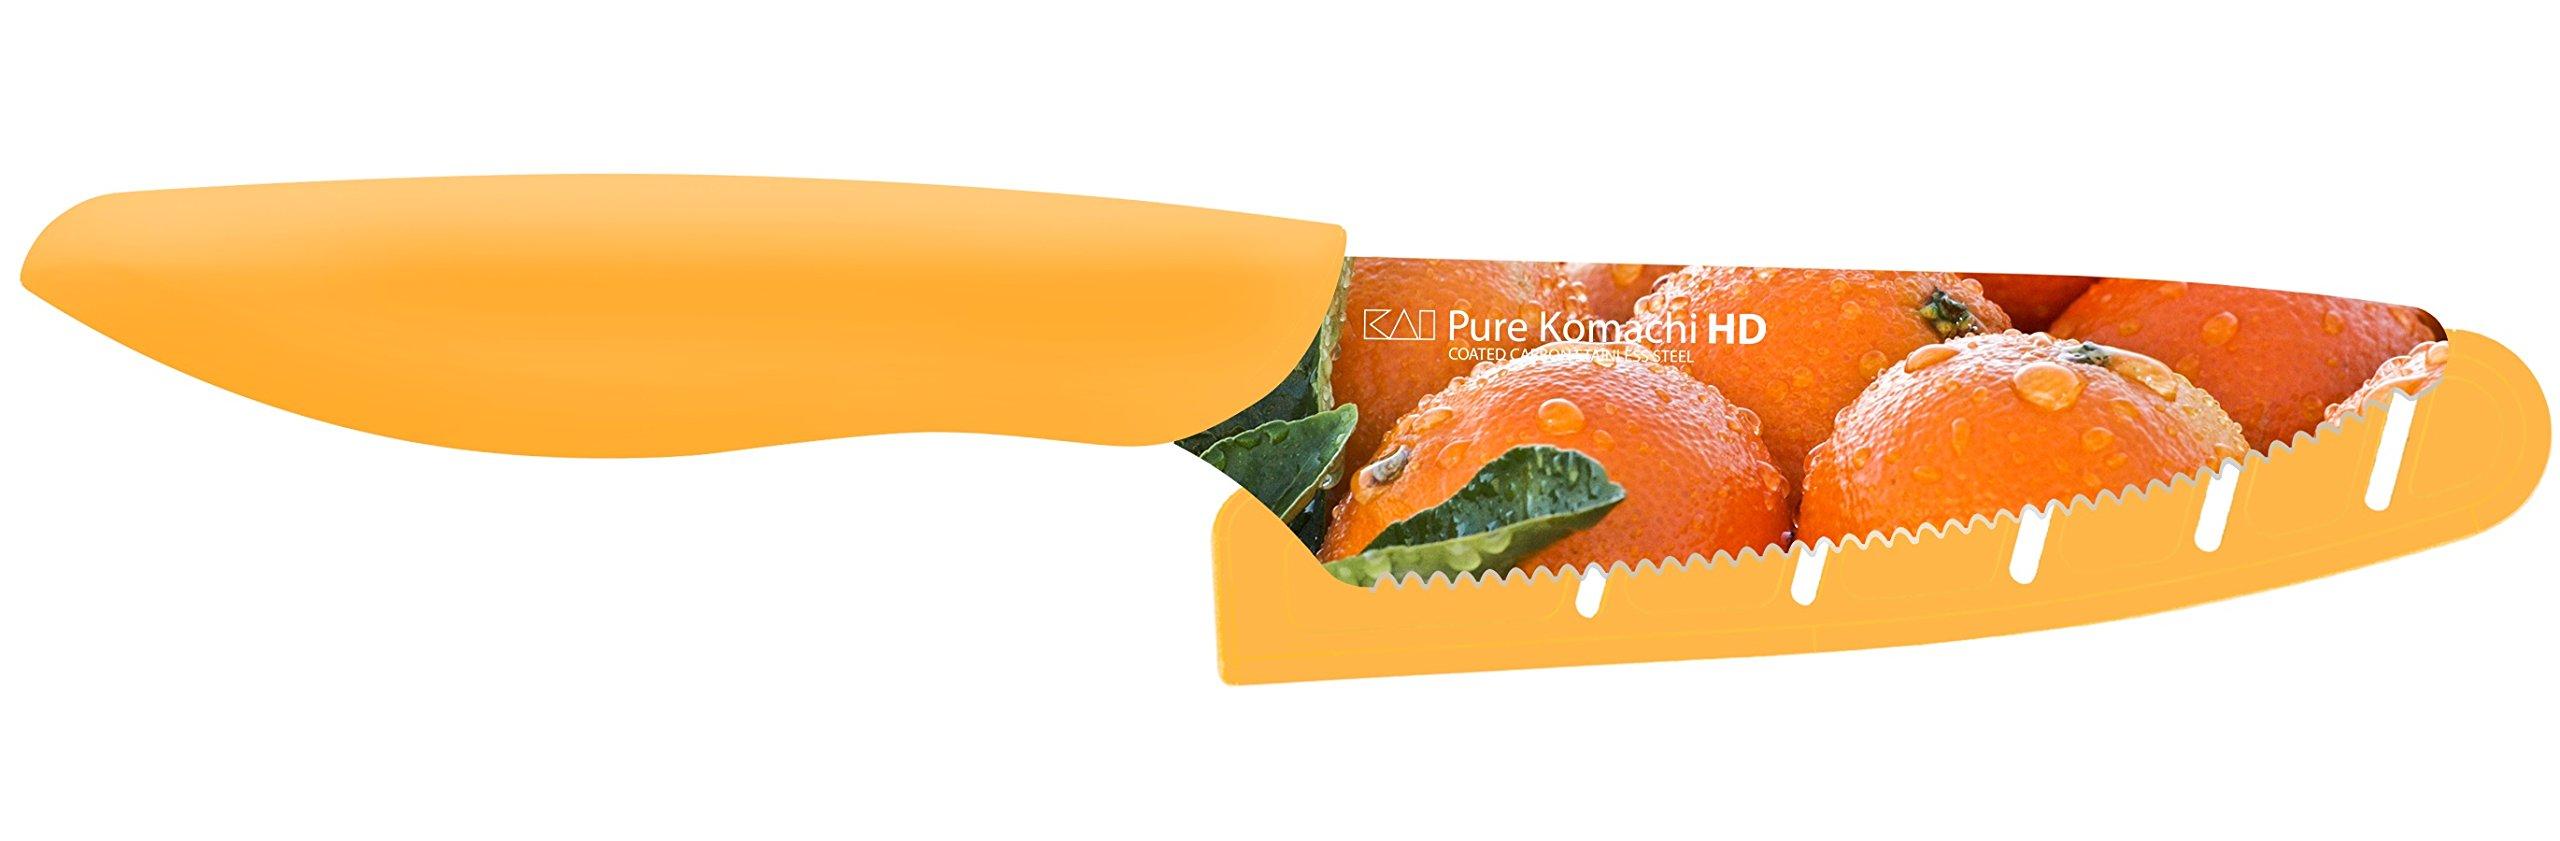 Kai USA Pure Komachi 2 AB9076 HD Photo Citrus Knife, 4-Inch, Oranges